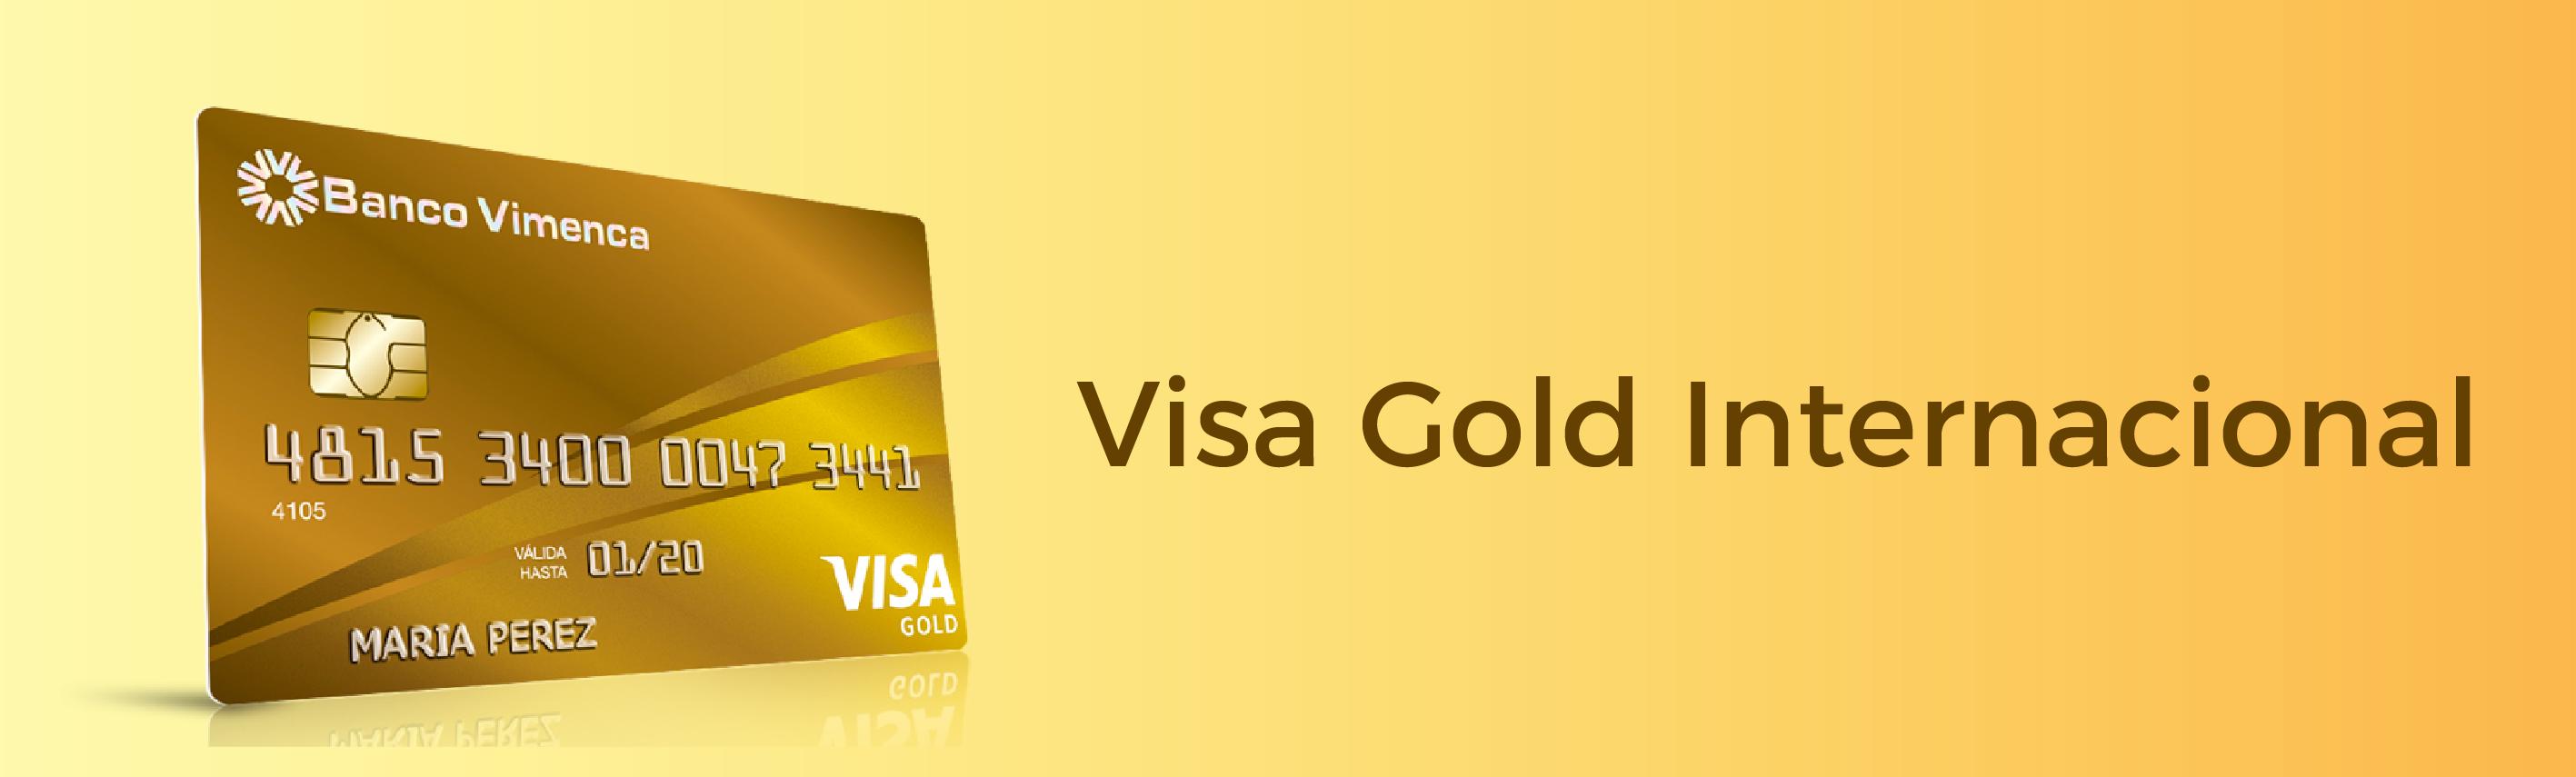 Tarjeta de Crédito Visa Gold Internacional